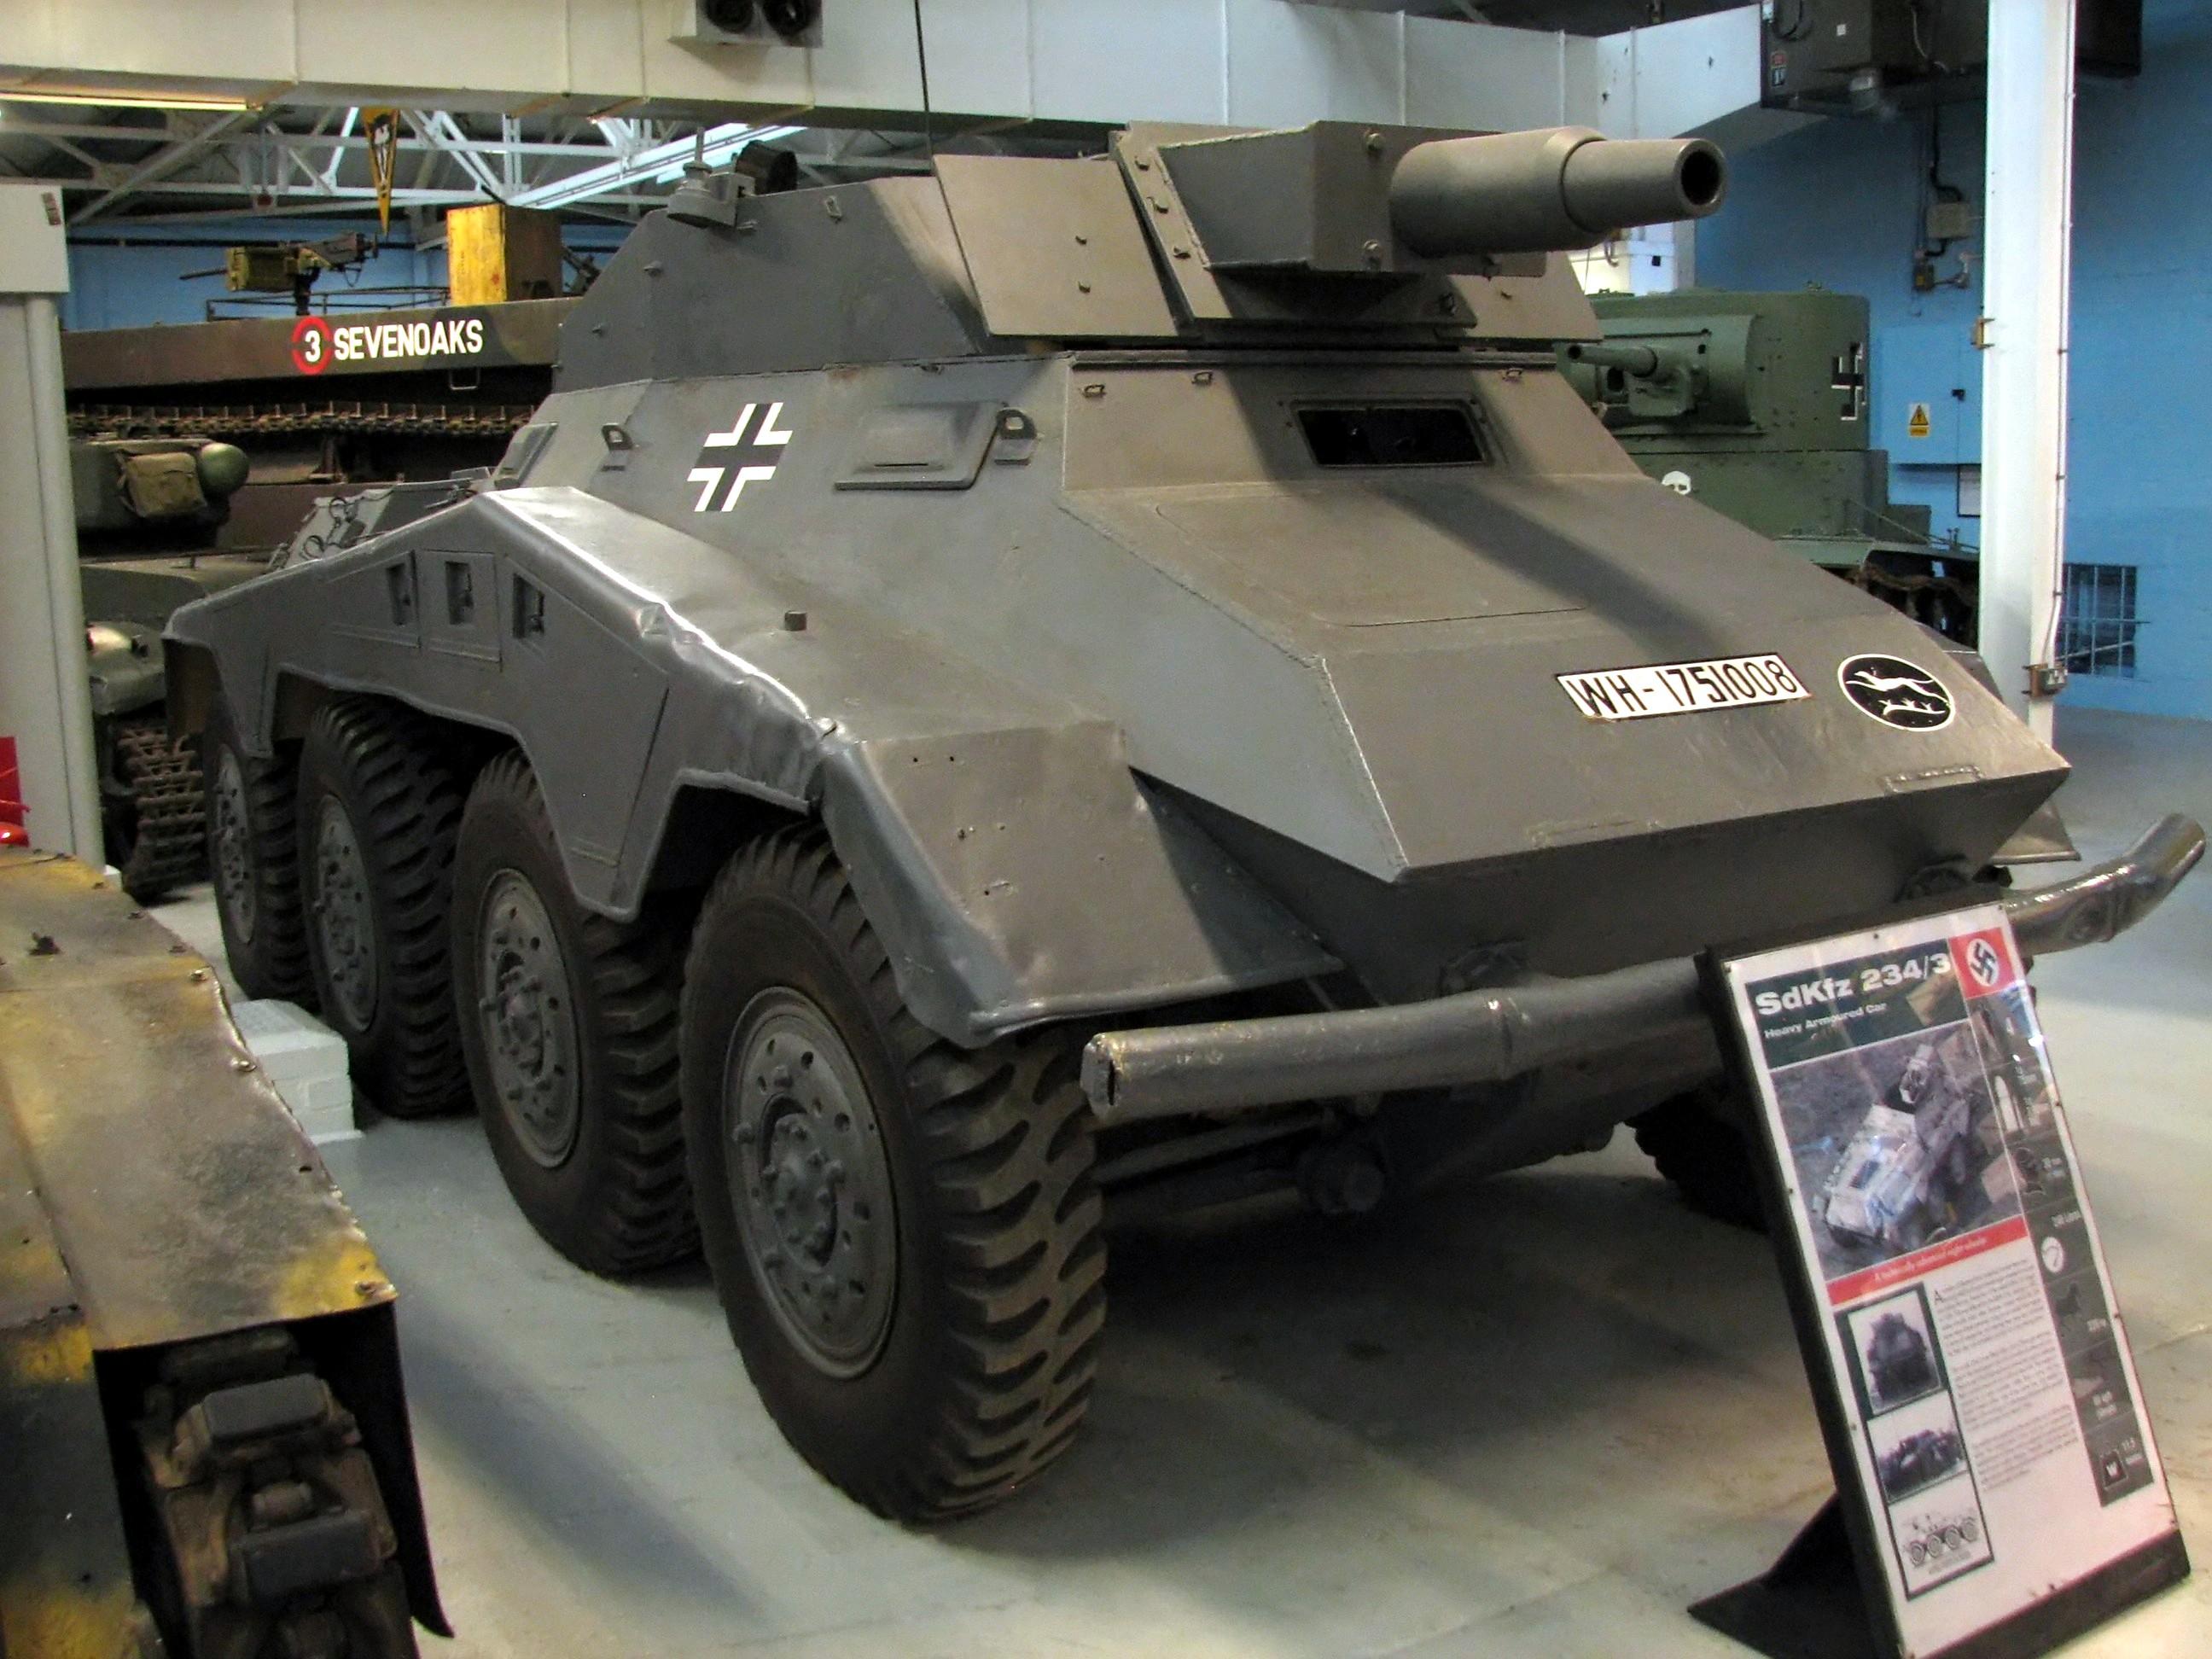 Iron Armor Truck Bed Coating Spray